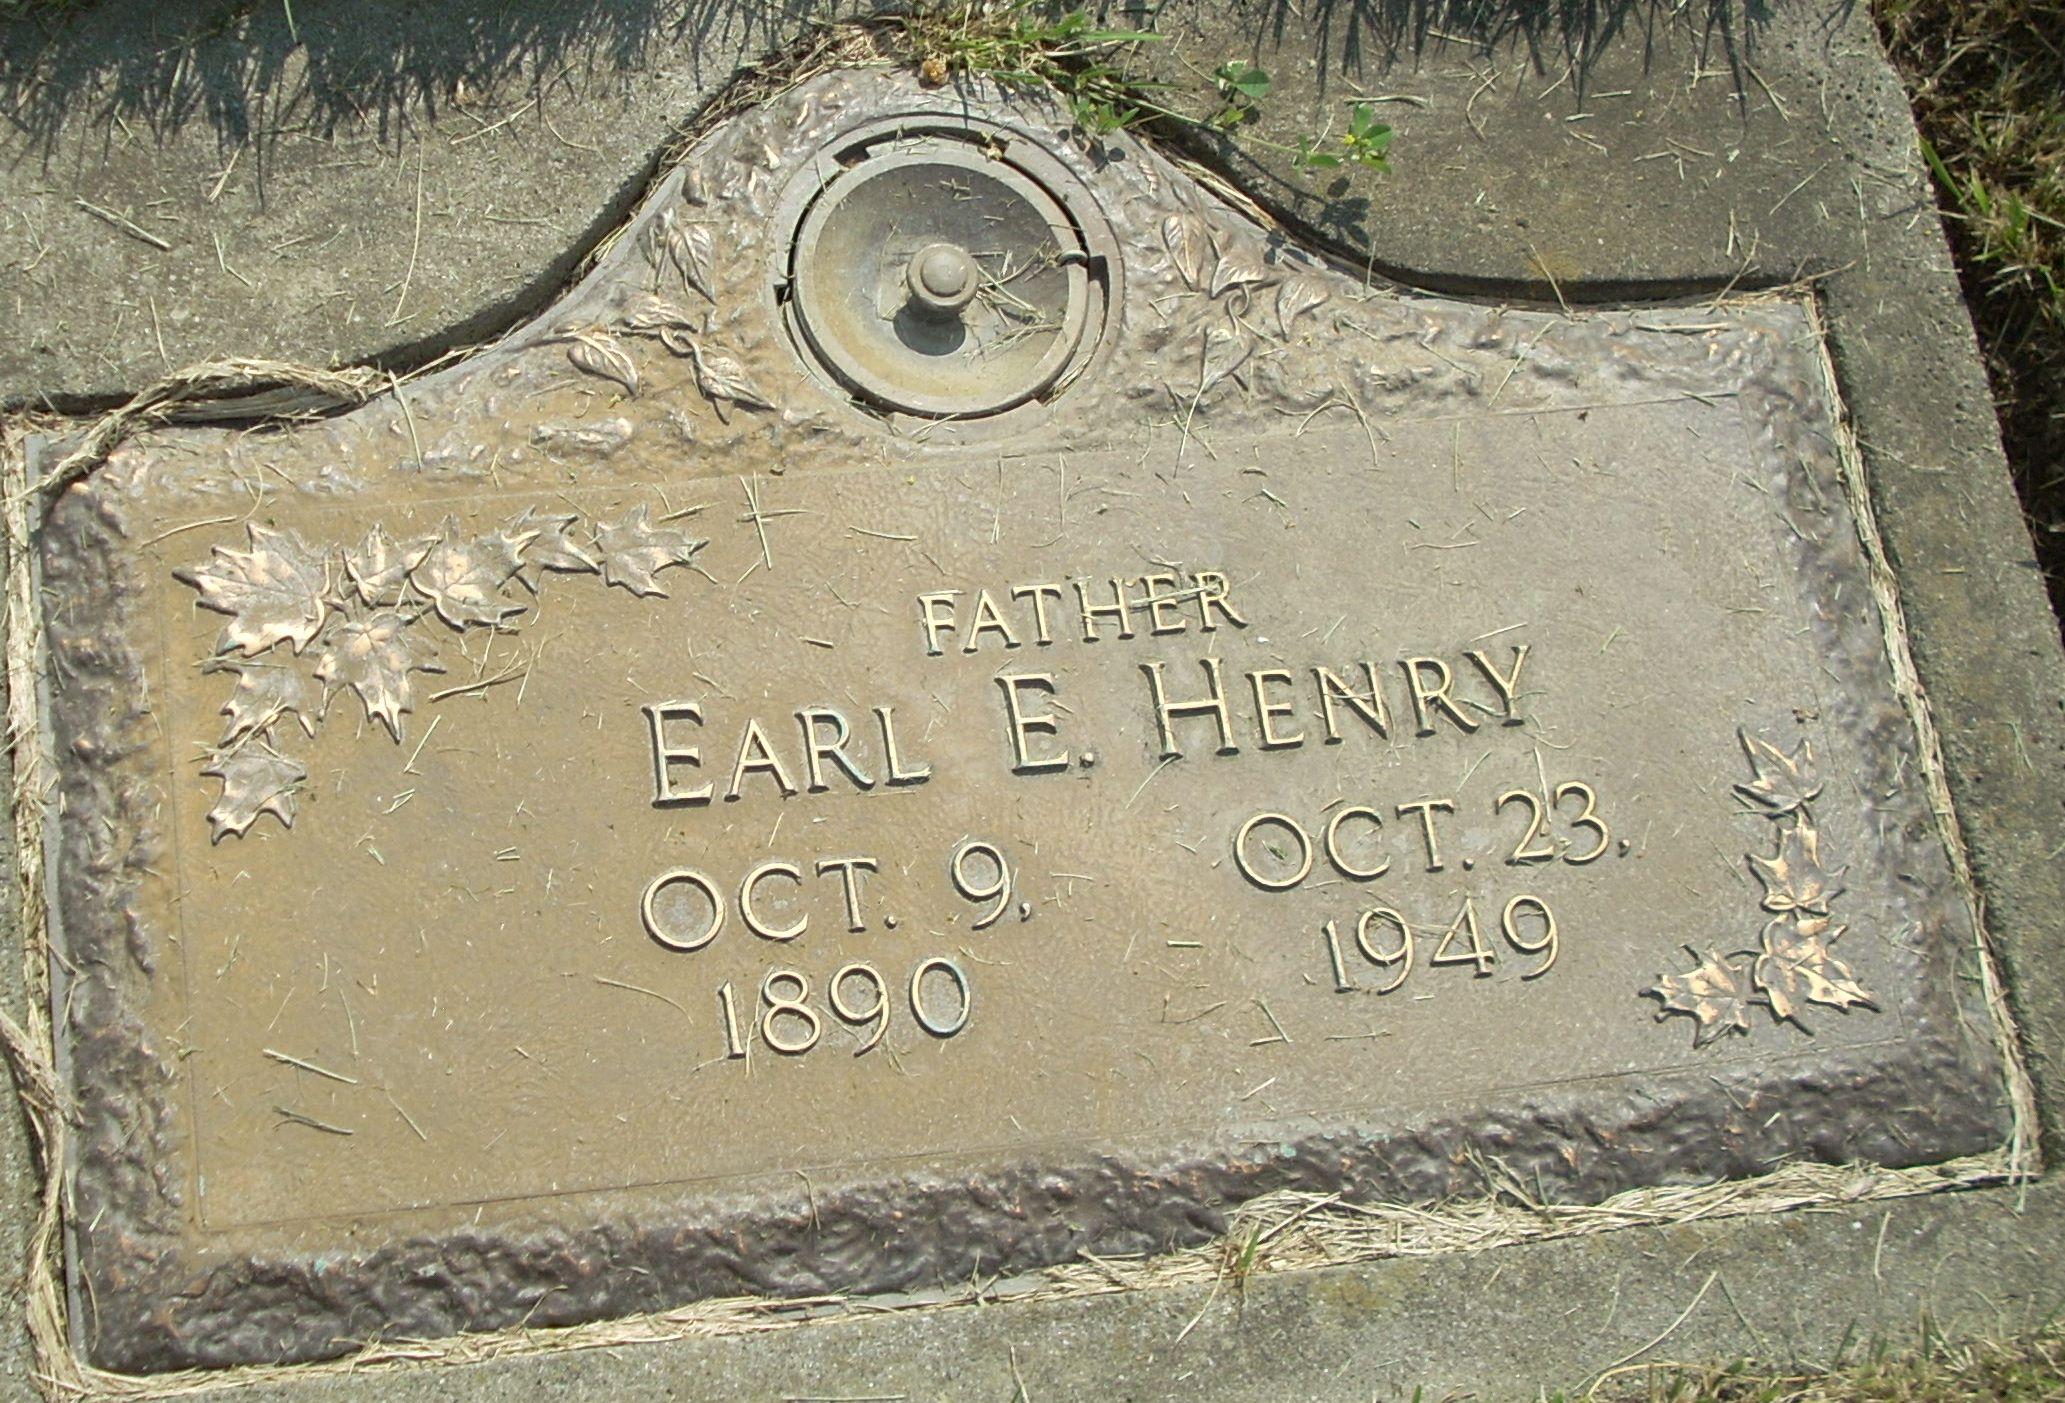 Earl Ernest Henry